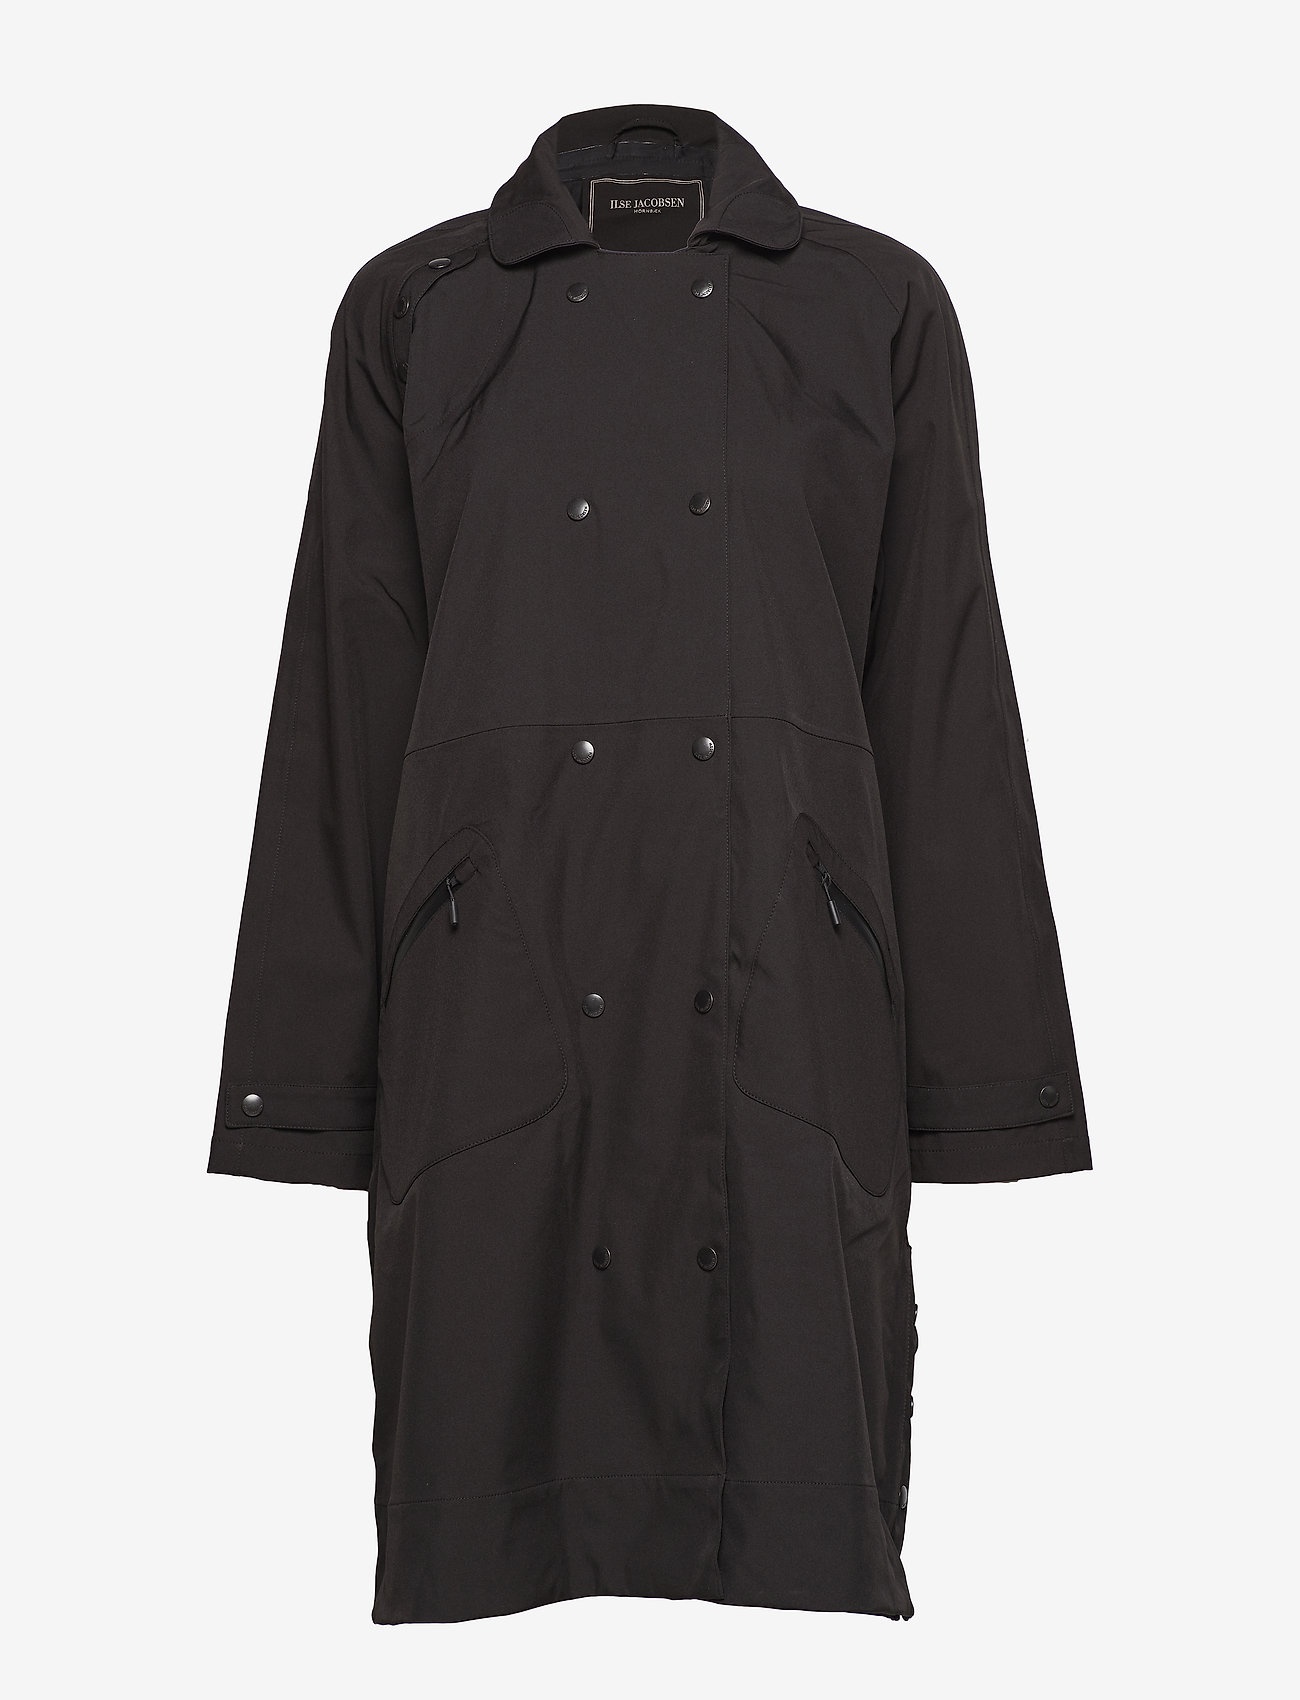 Ilse Jacobsen Rain Coat - Jackets & Coats